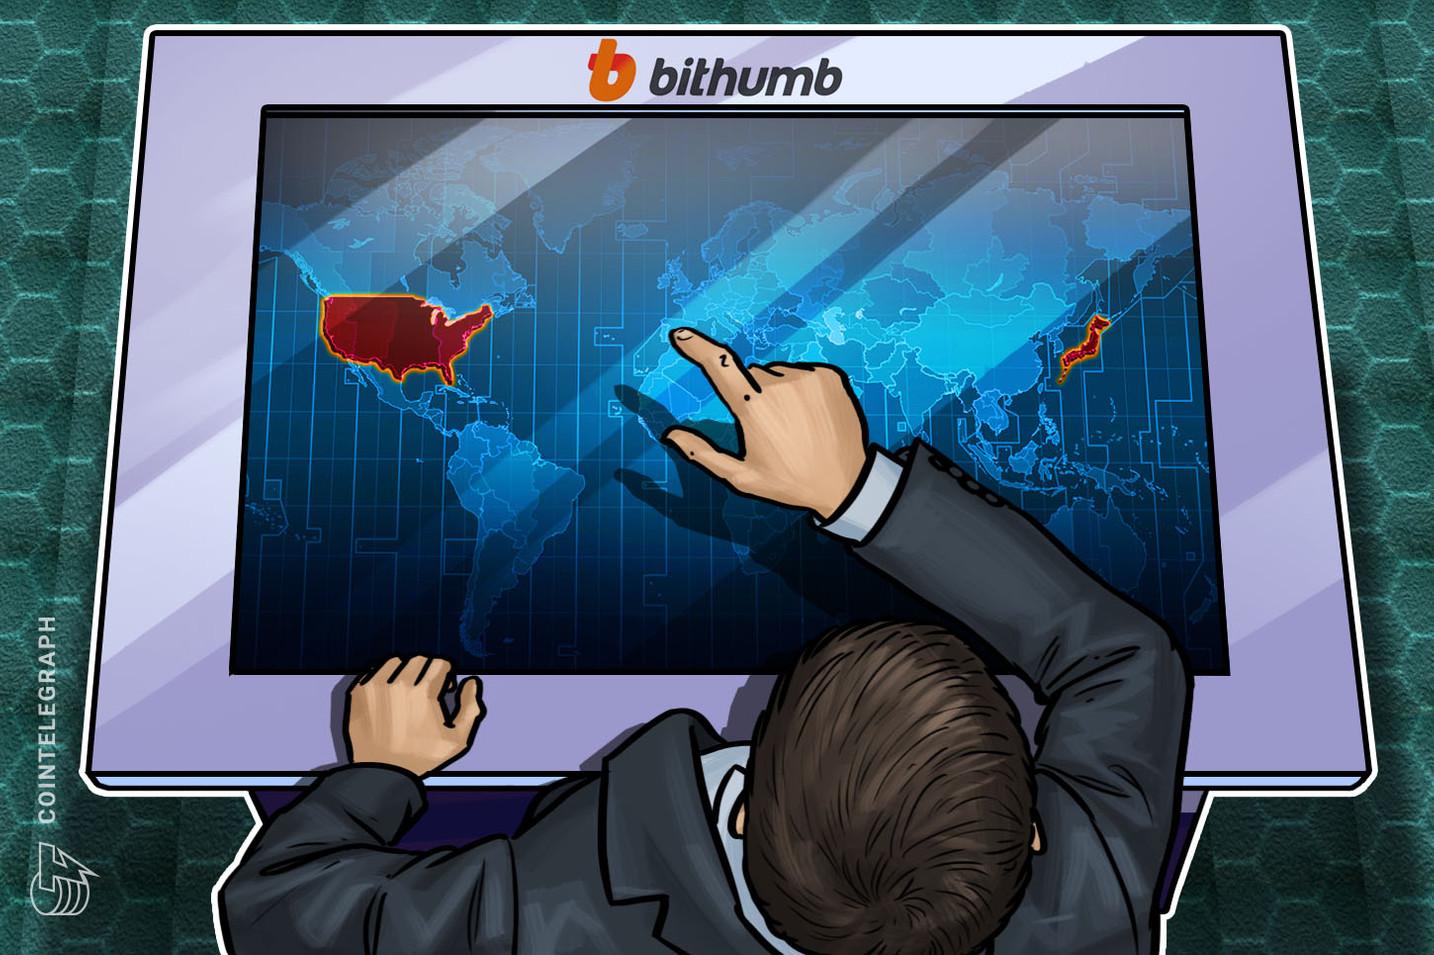 Südkorea: Bithumbs Operator enthüllt Pläne für Märkte in den USA und Japan